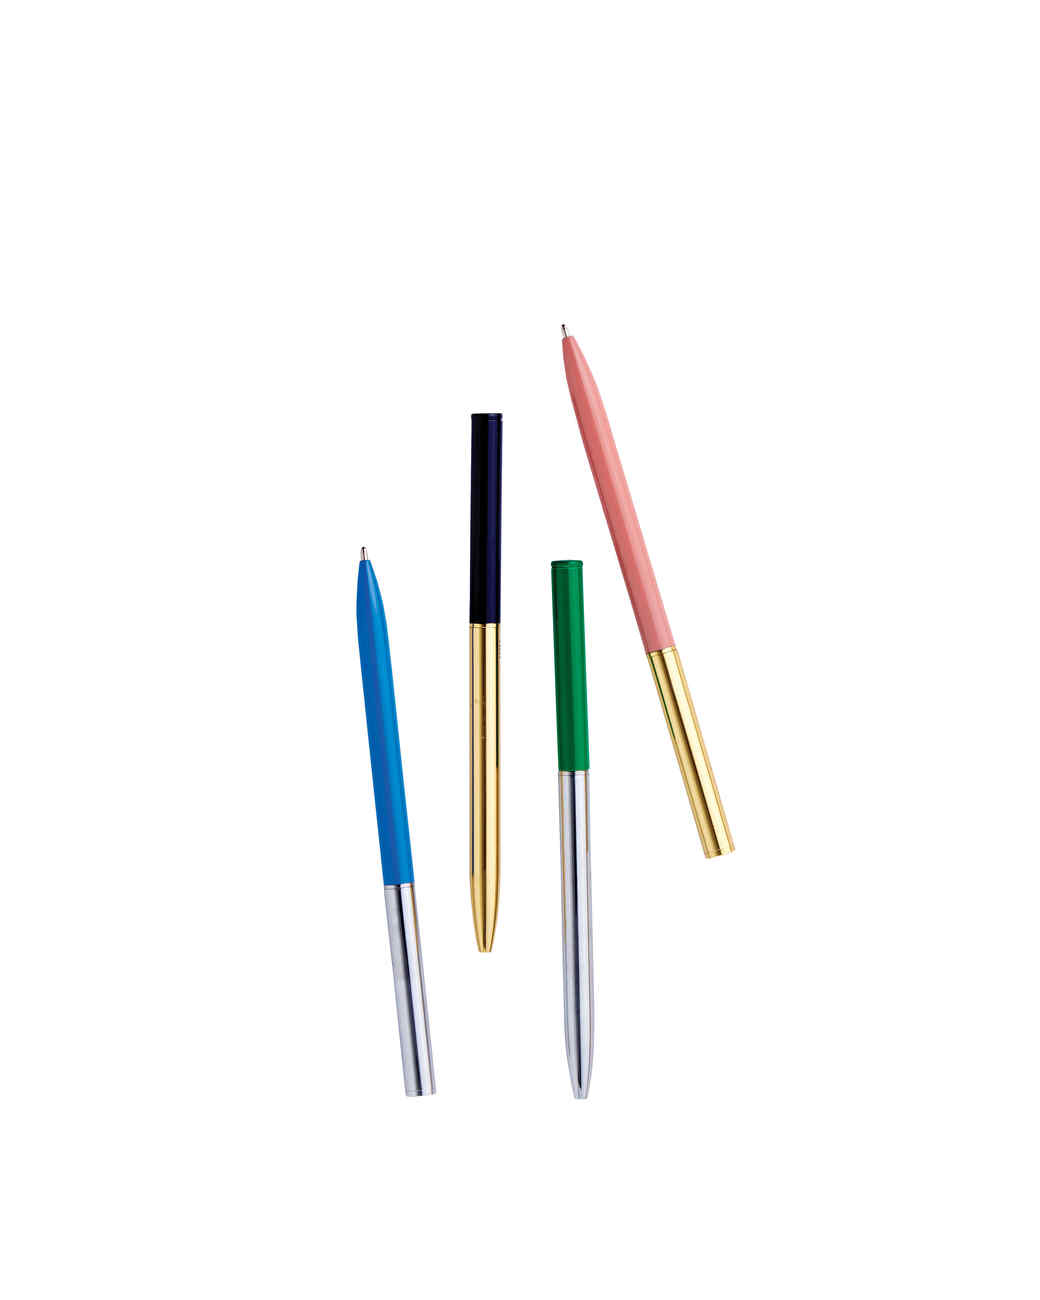 pens-8112-d112912_l.jpg